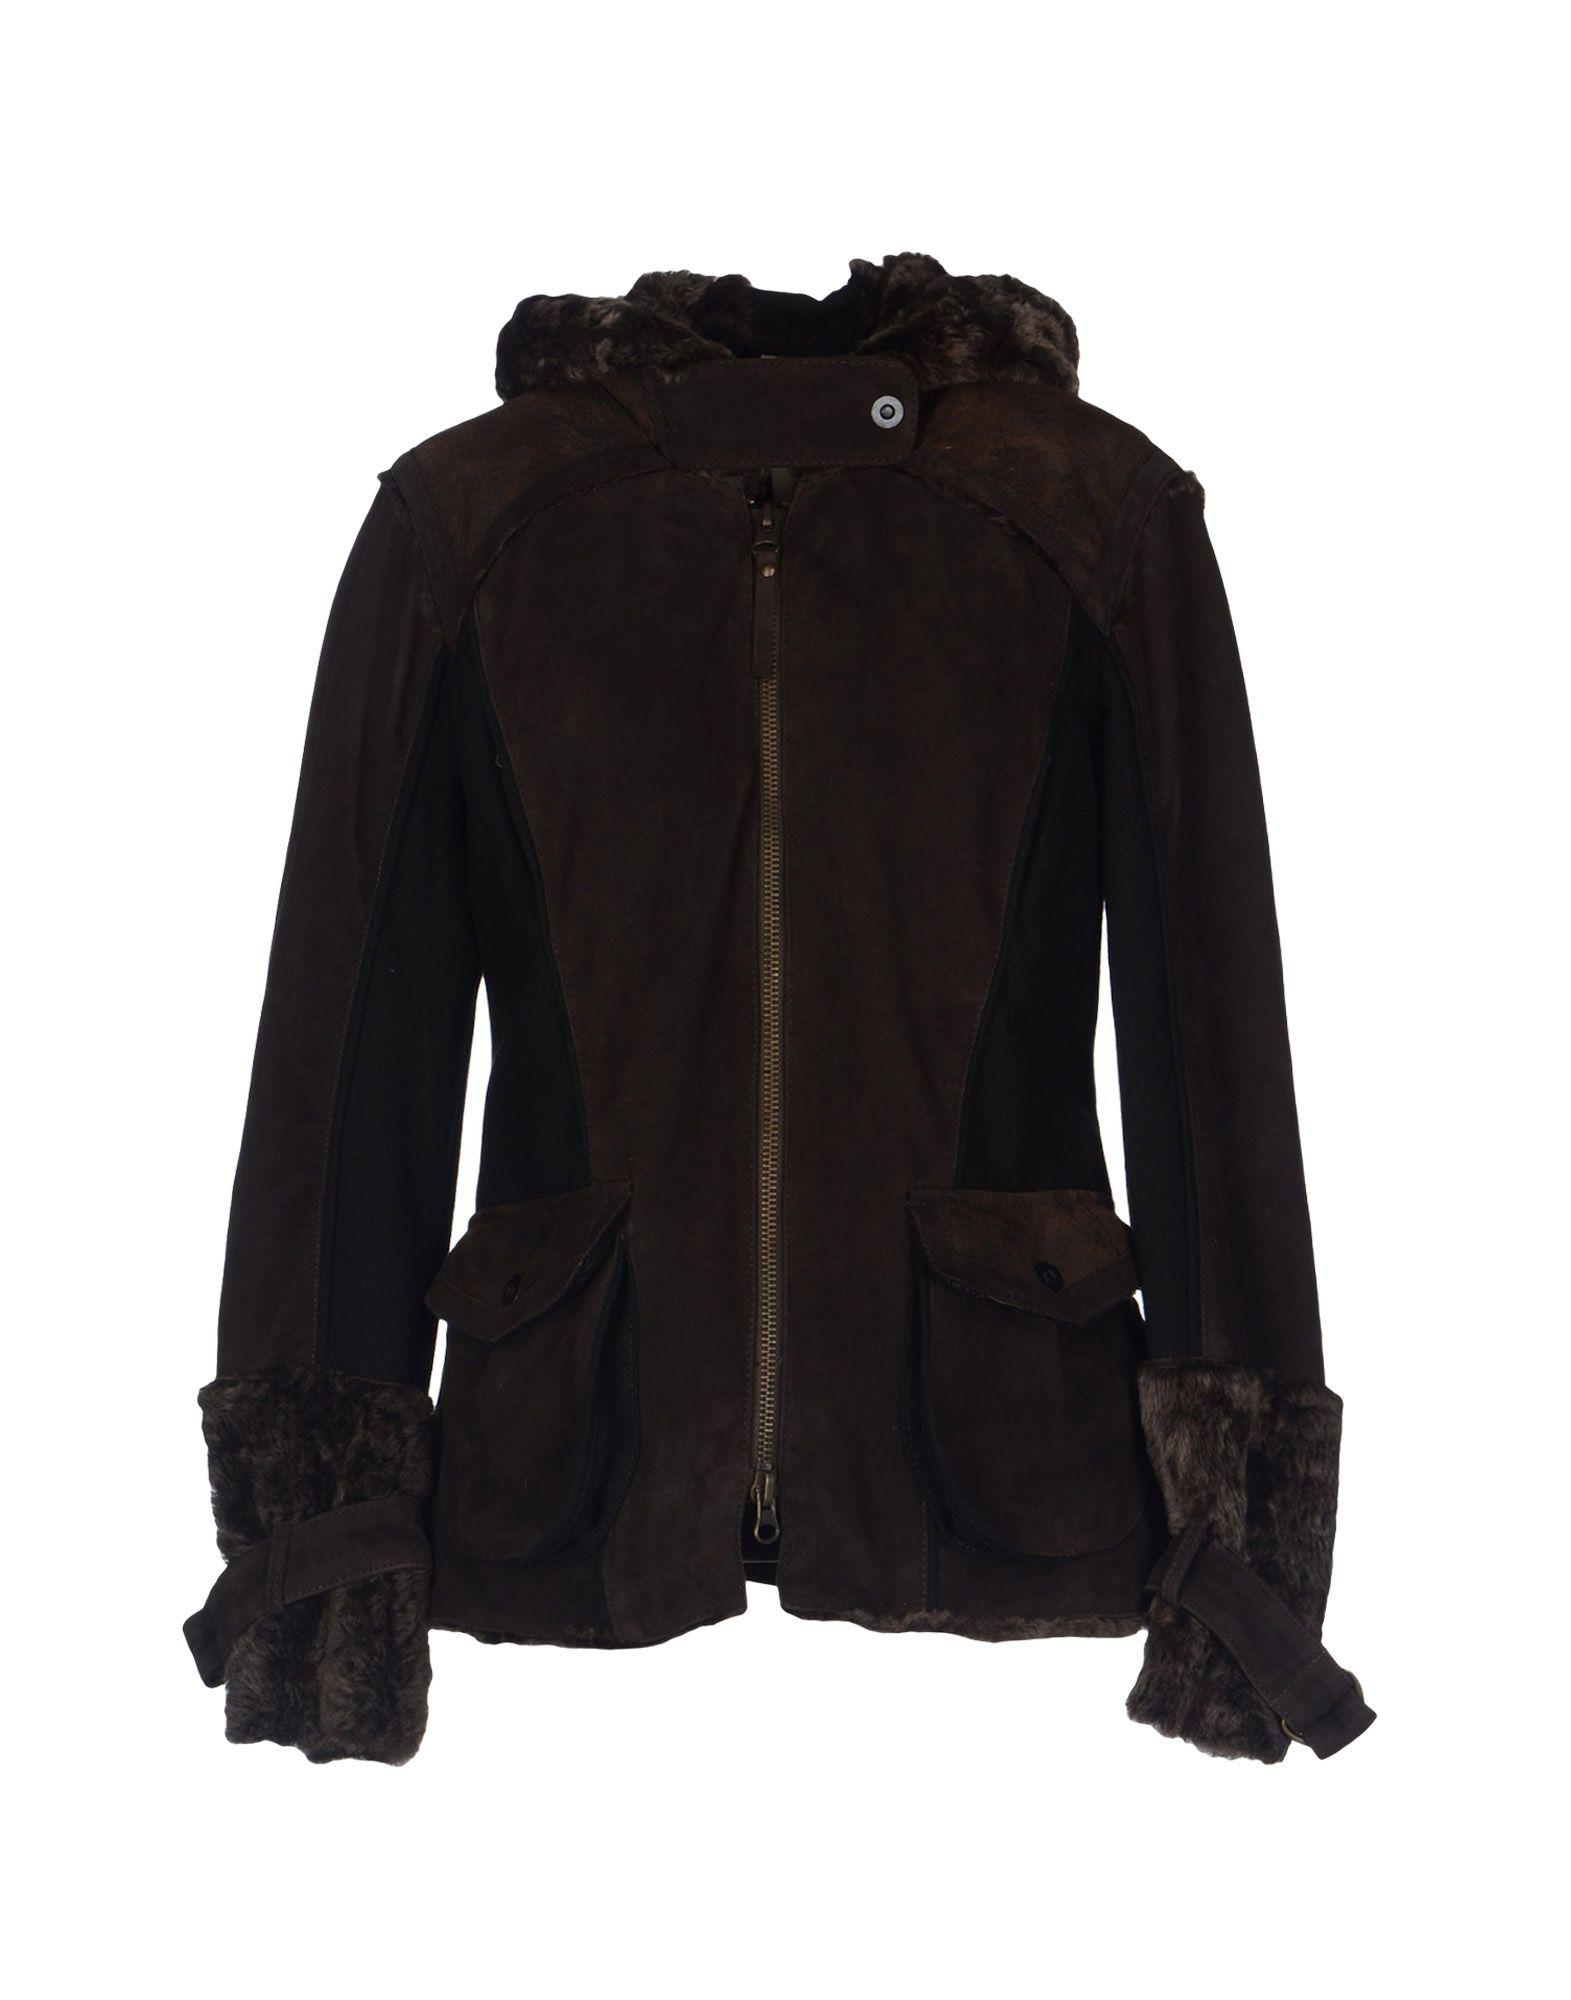 COMPAGNIA Damen Lederjacke/Mantel Farbe Dunkelbraun Größe 5 - broschei